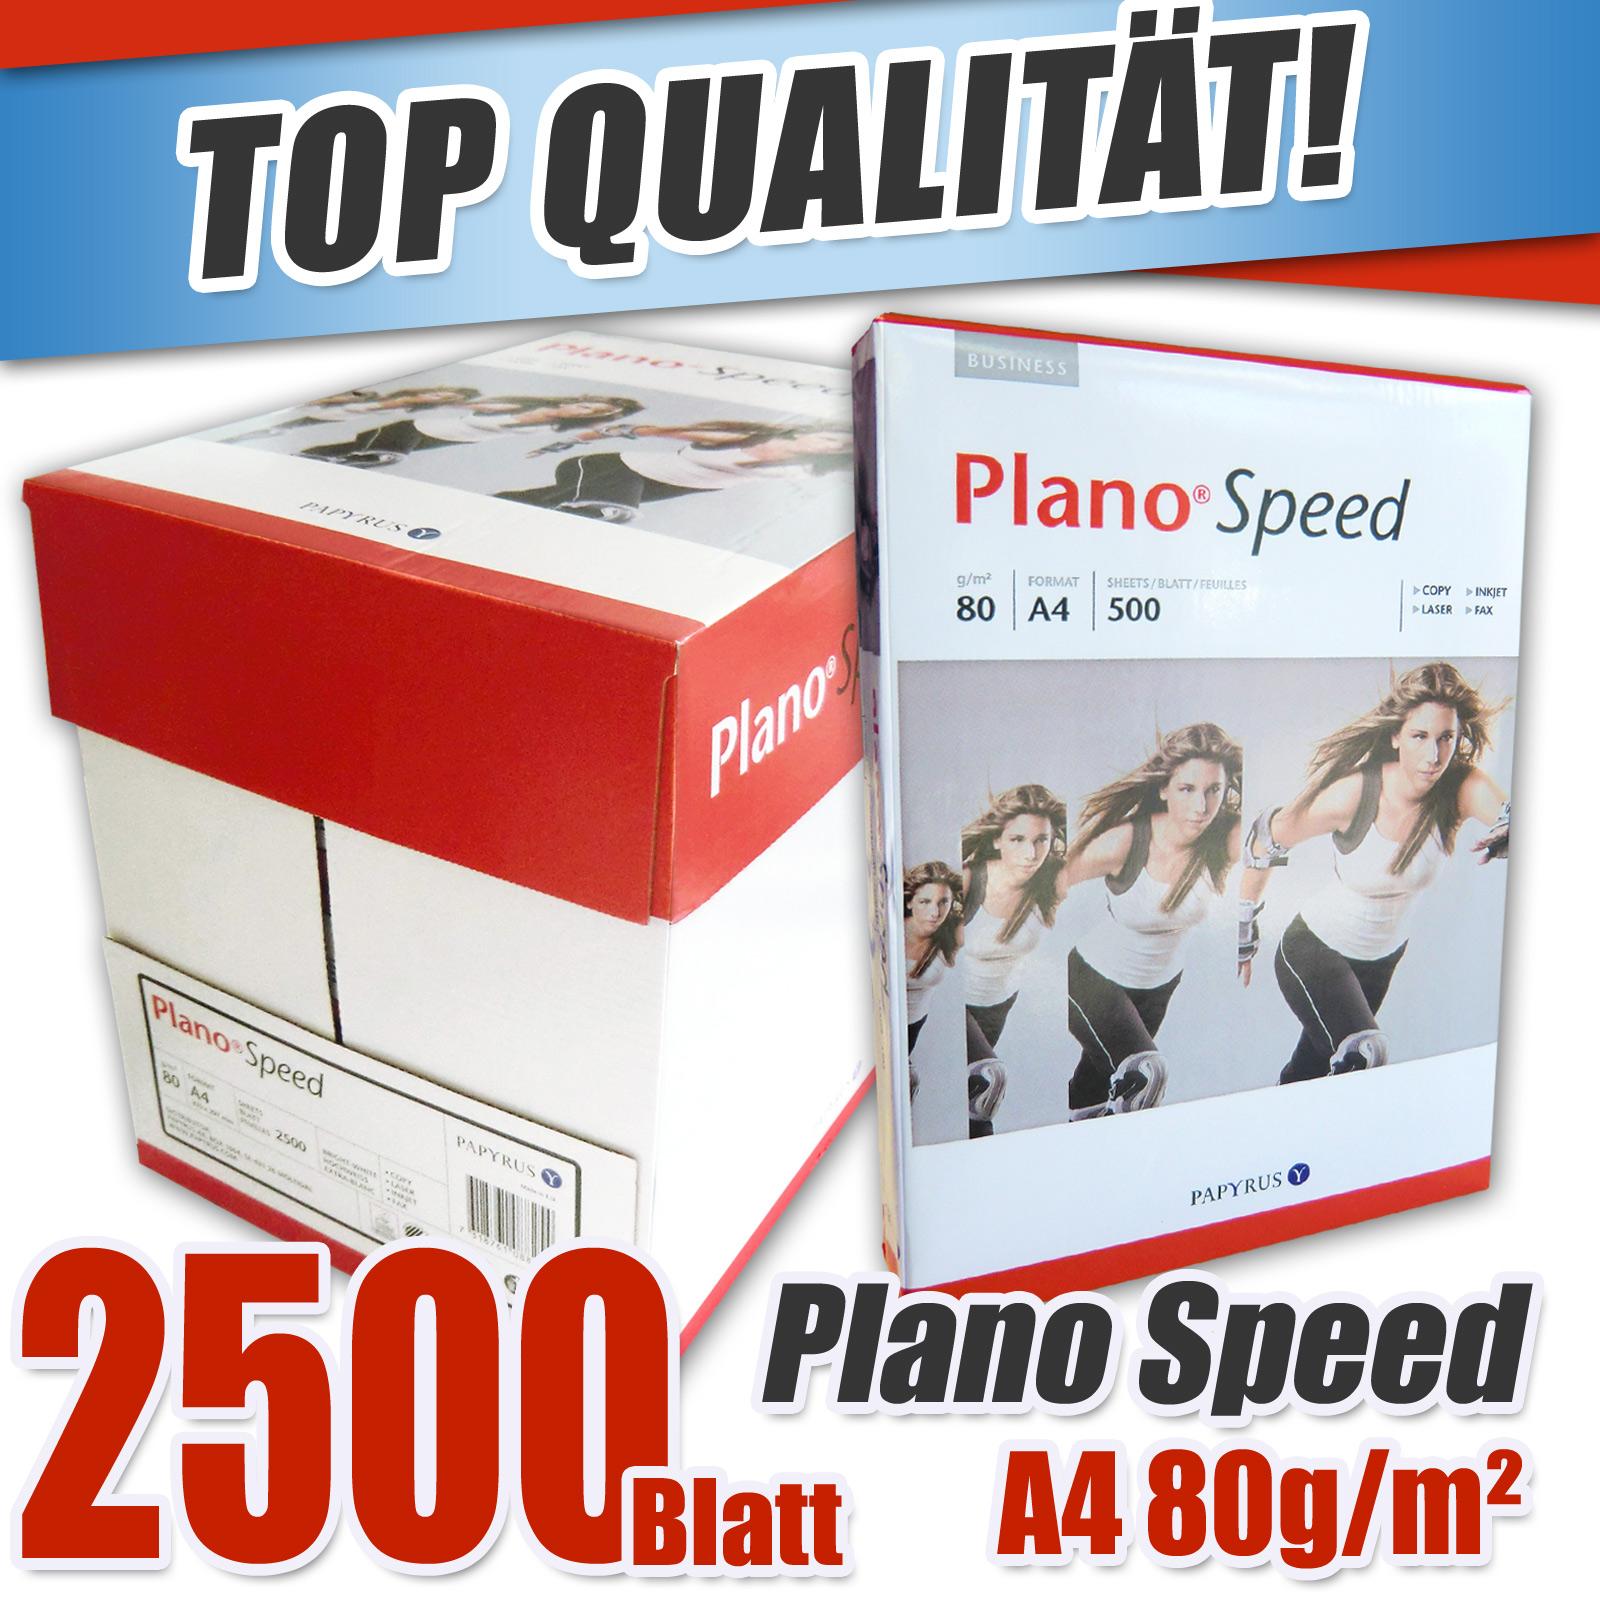 2500x kopierpapier din a4 papyrus plano speed druckerpapier fax copy paper laser ebay. Black Bedroom Furniture Sets. Home Design Ideas